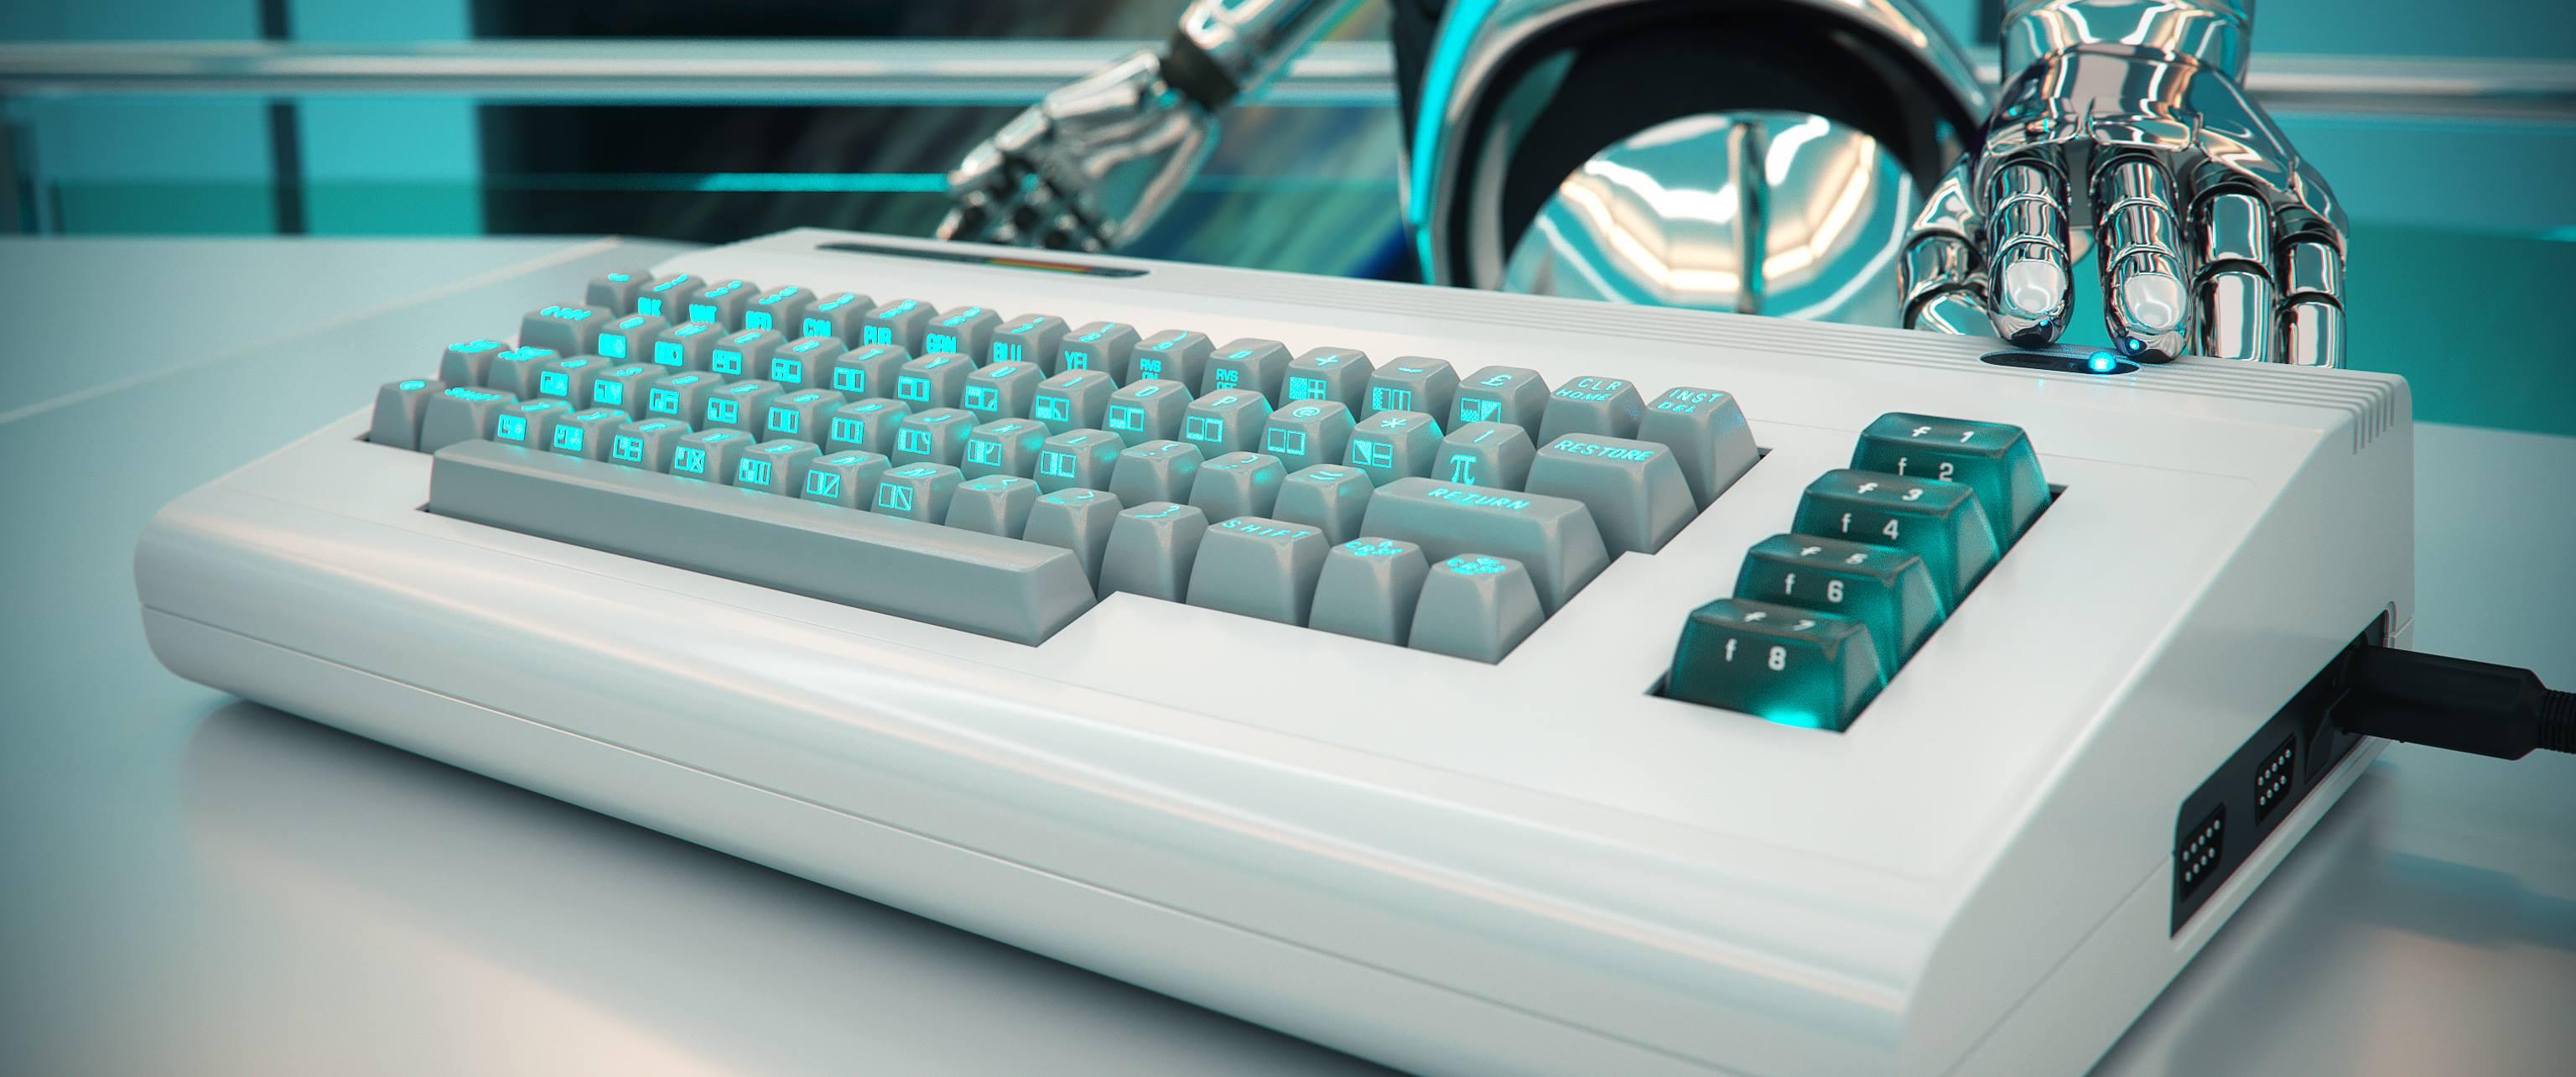 C64000